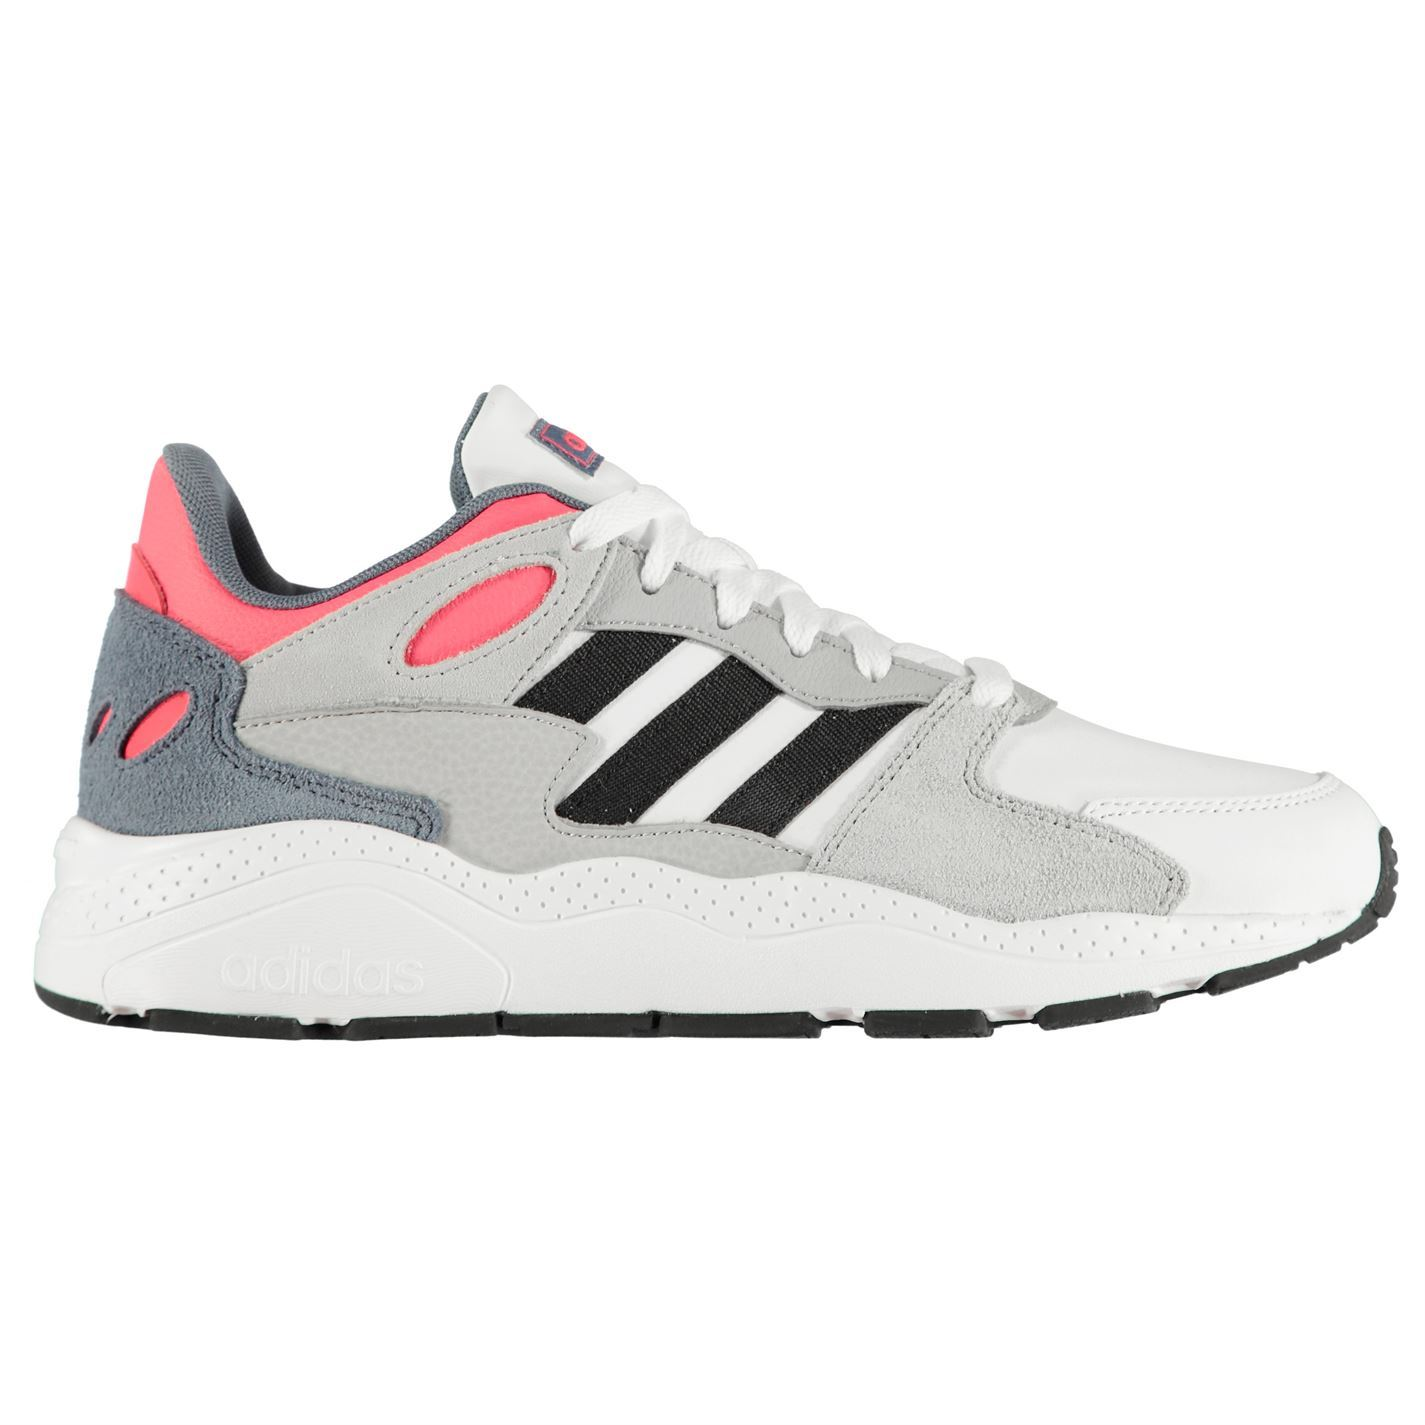 Adidas-Crazychaos-Baskets-Homme-Chaussures-De-Loisirs-Chaussures-Baskets miniature 27